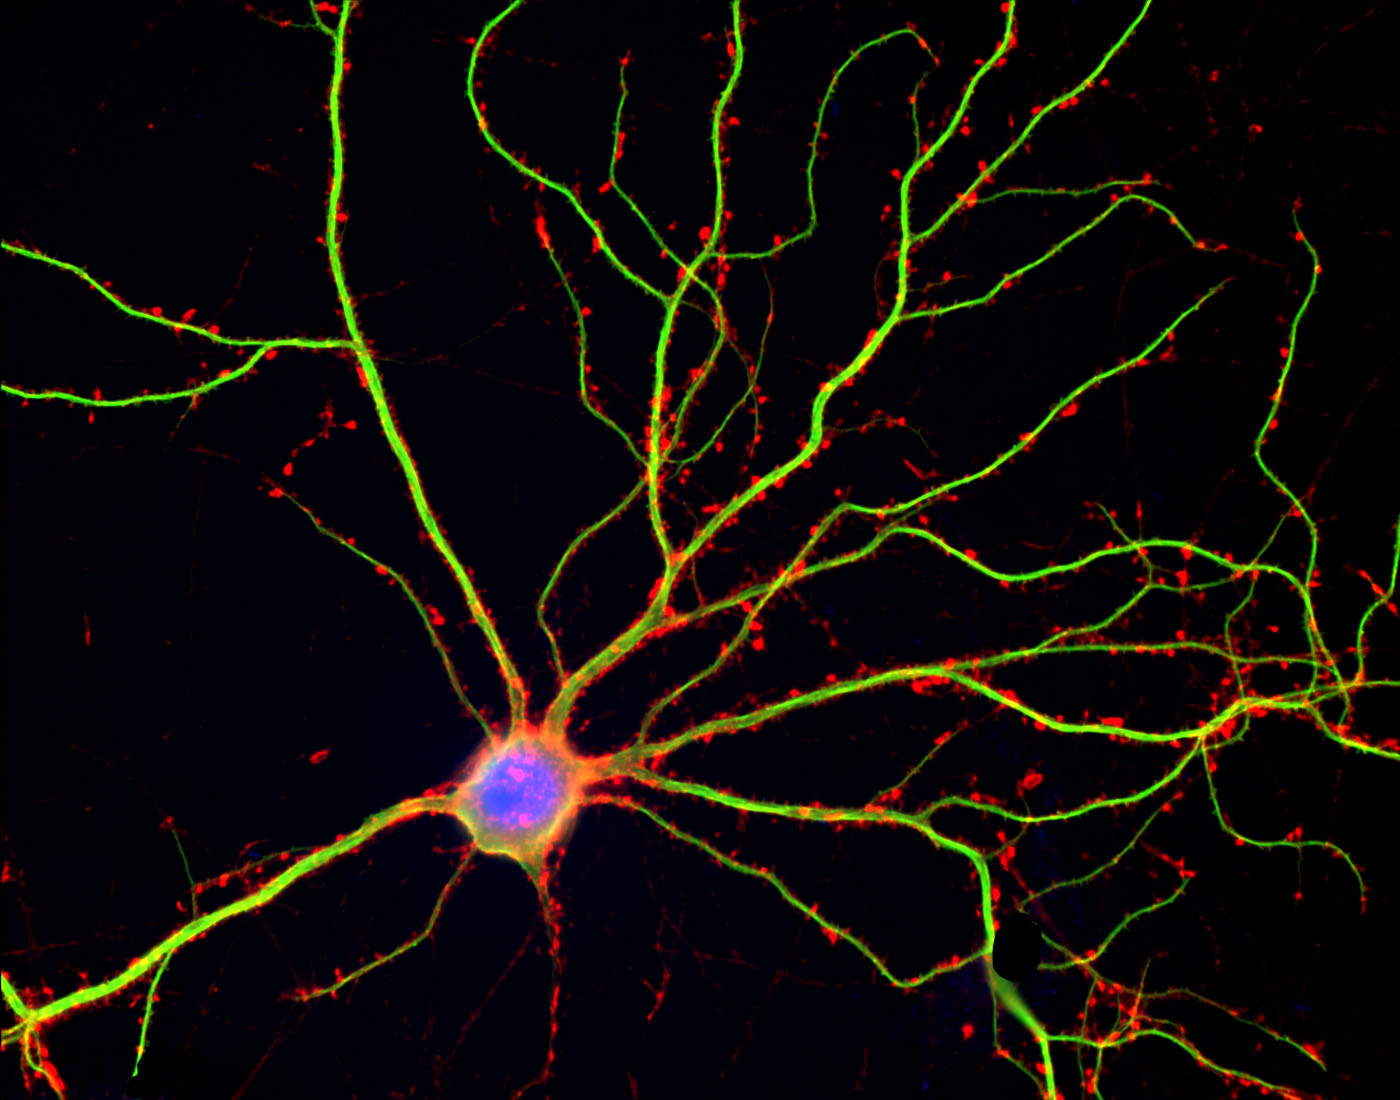 Mature neuron